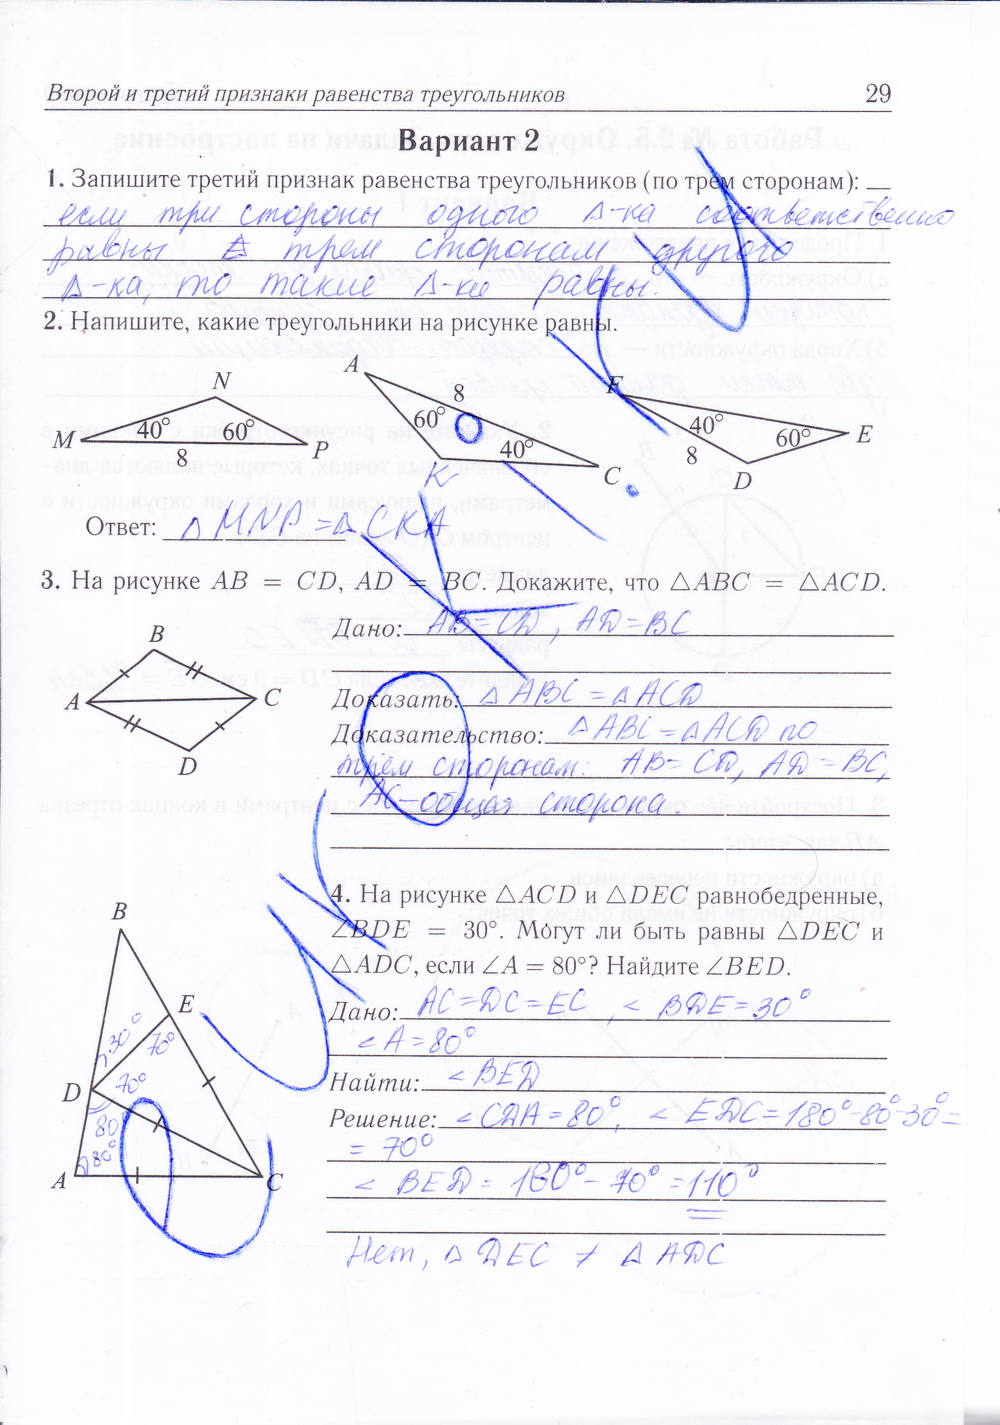 кулабухова лысенко тетрадь 7 рабочая и класс гдз по геометрии